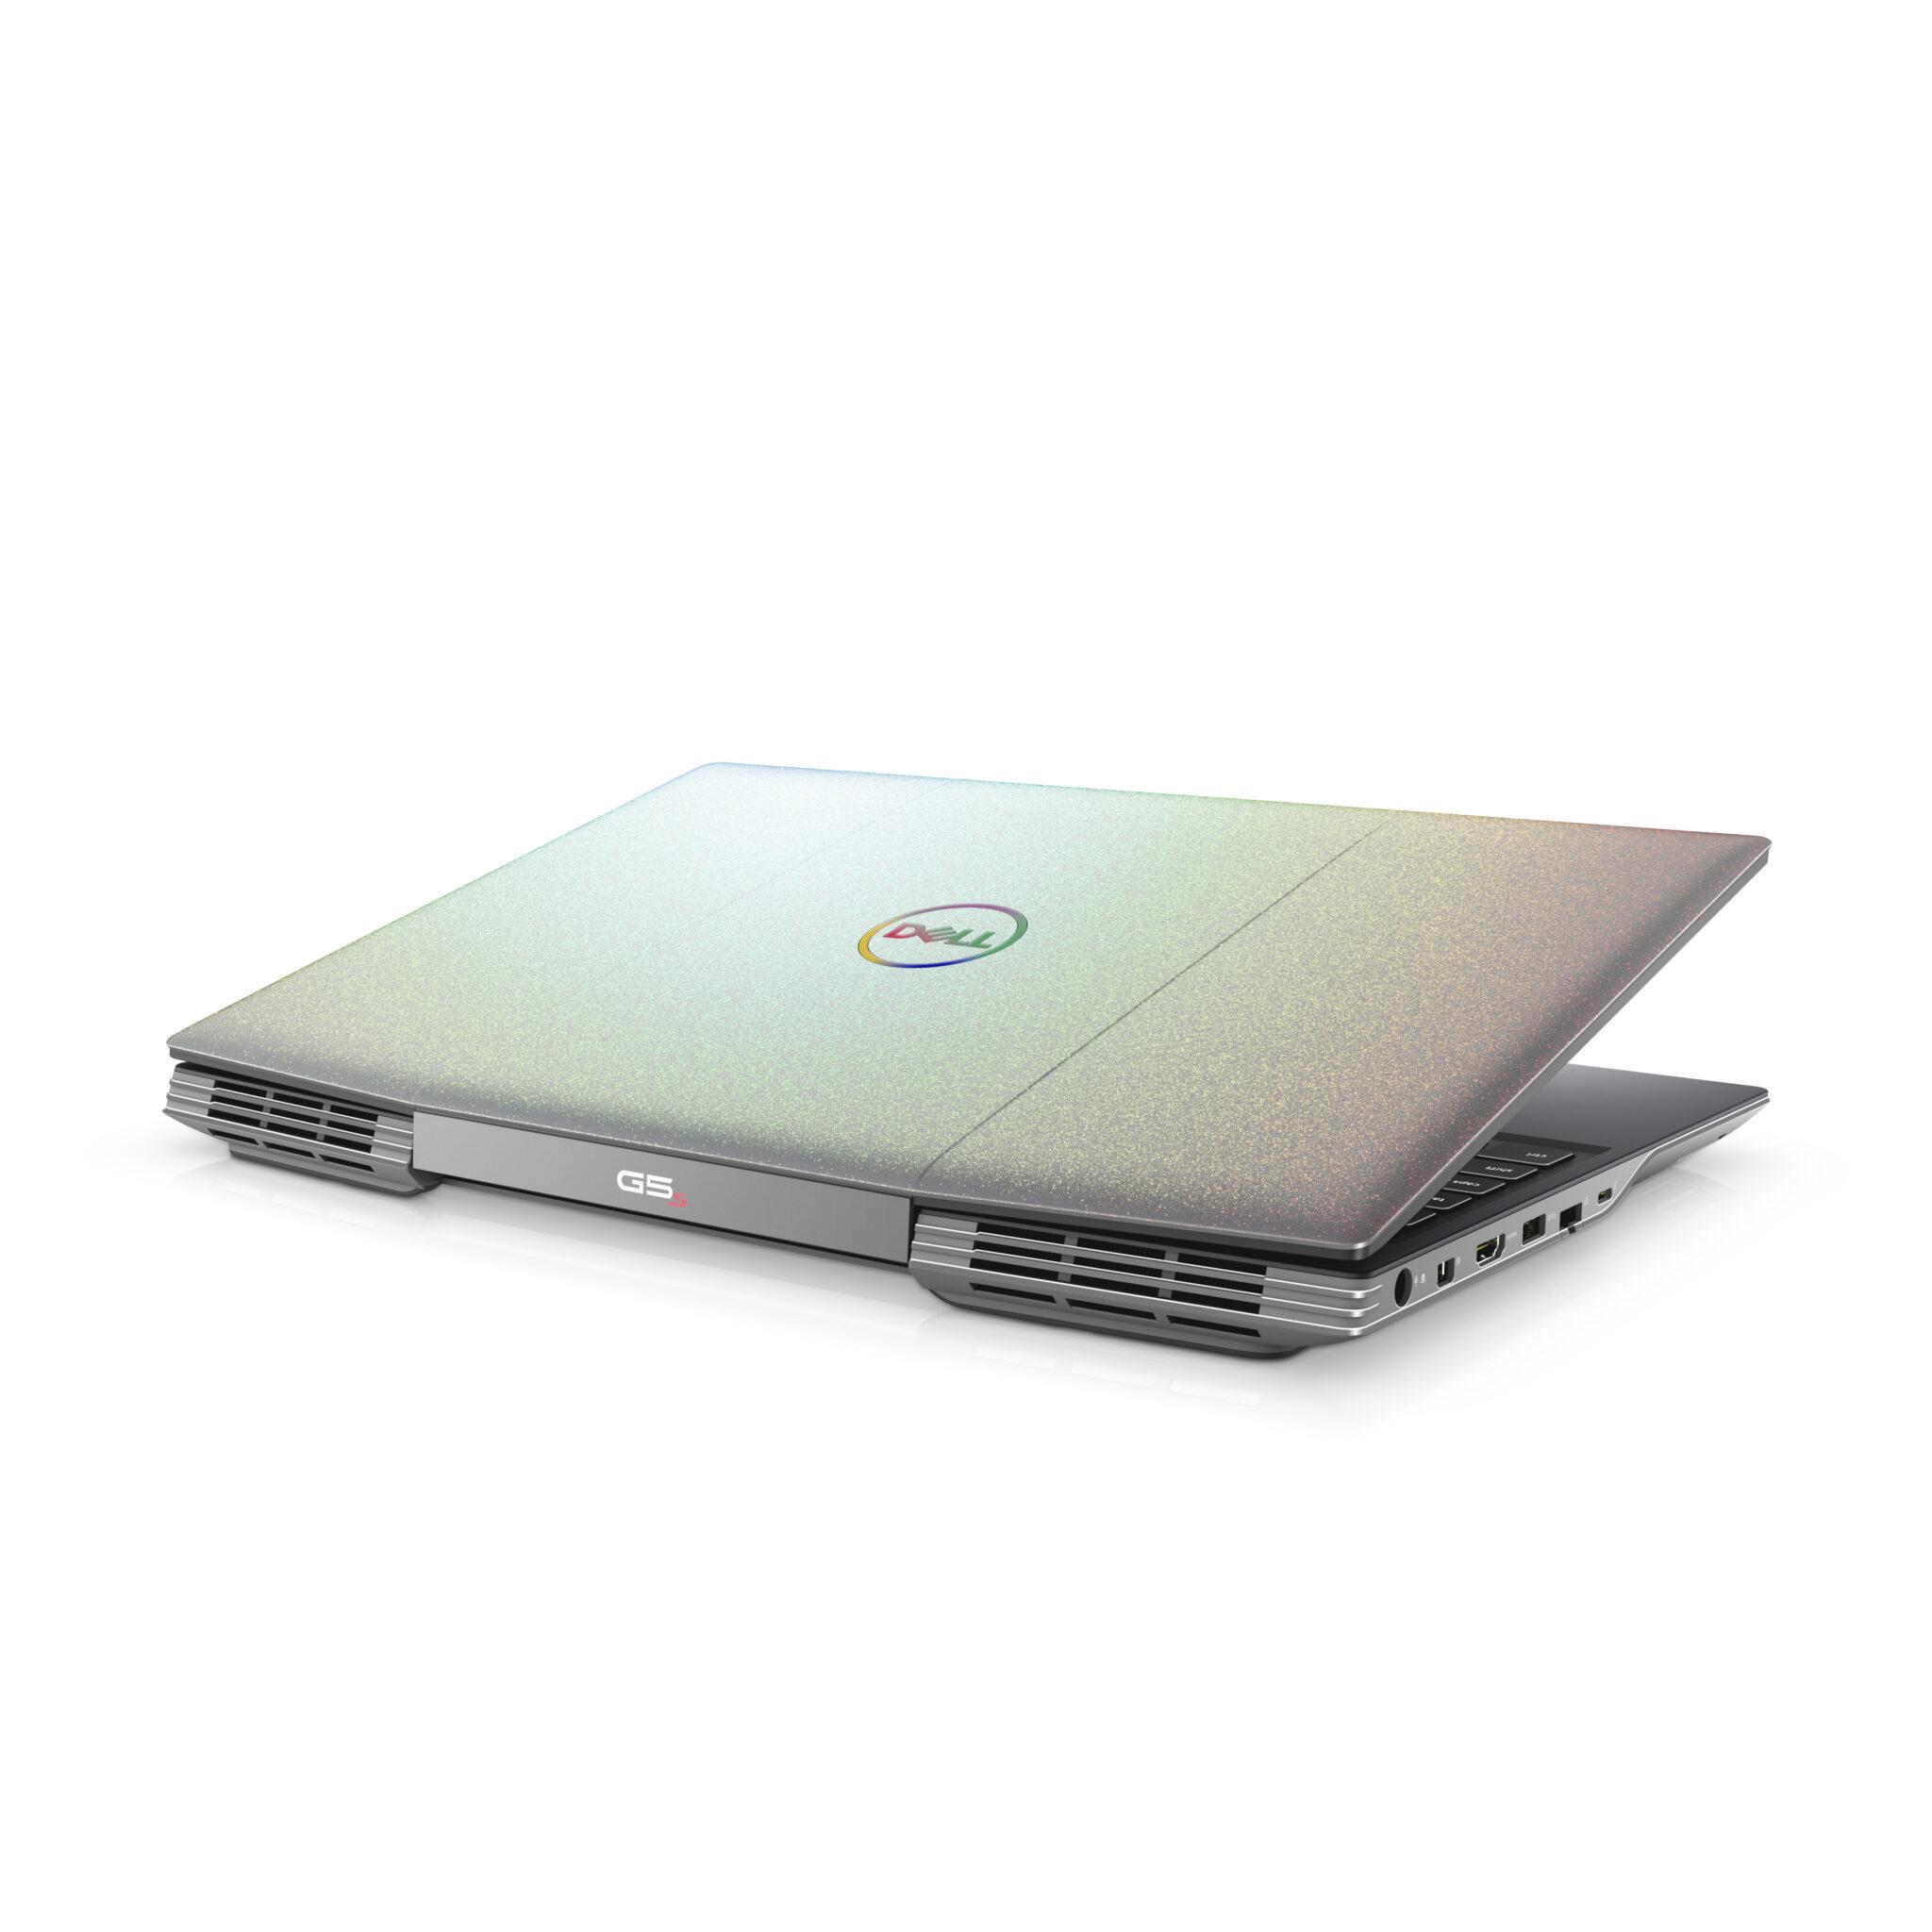 Dell G5 15 SE external